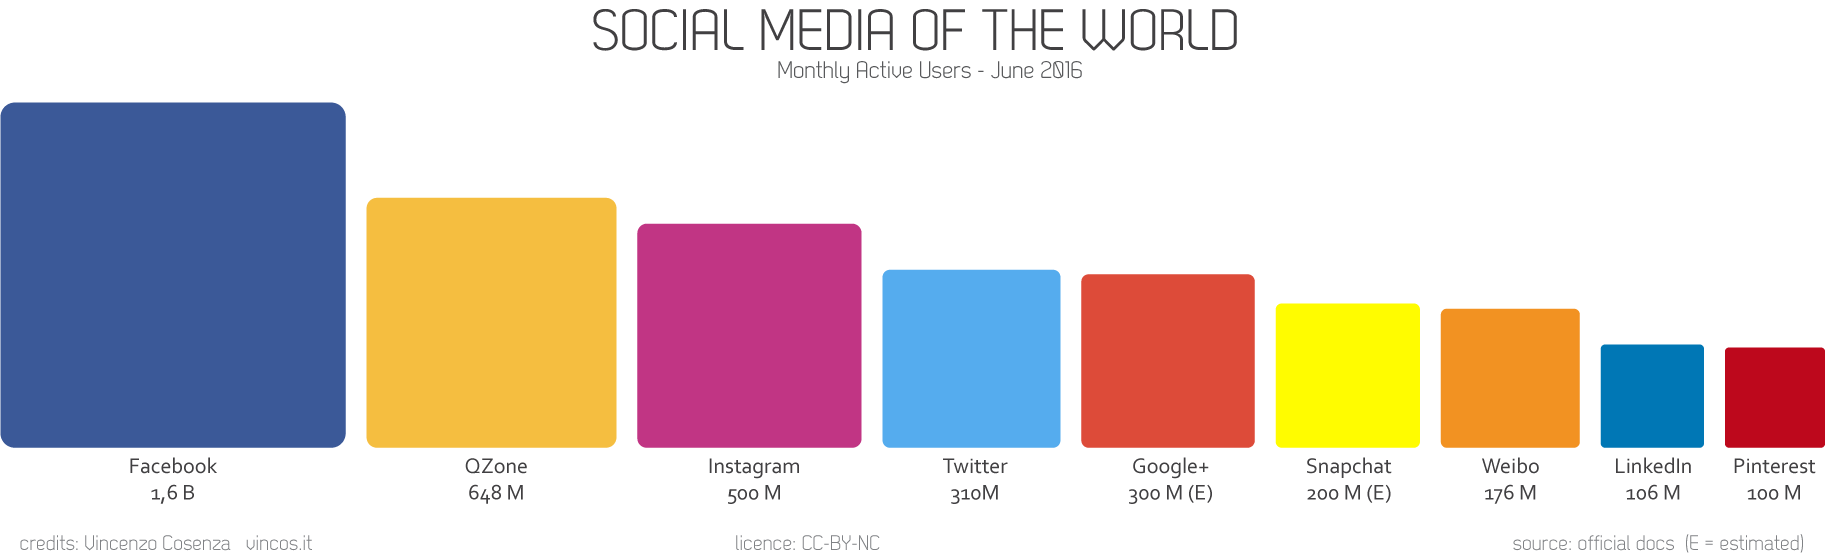 social media users statistics